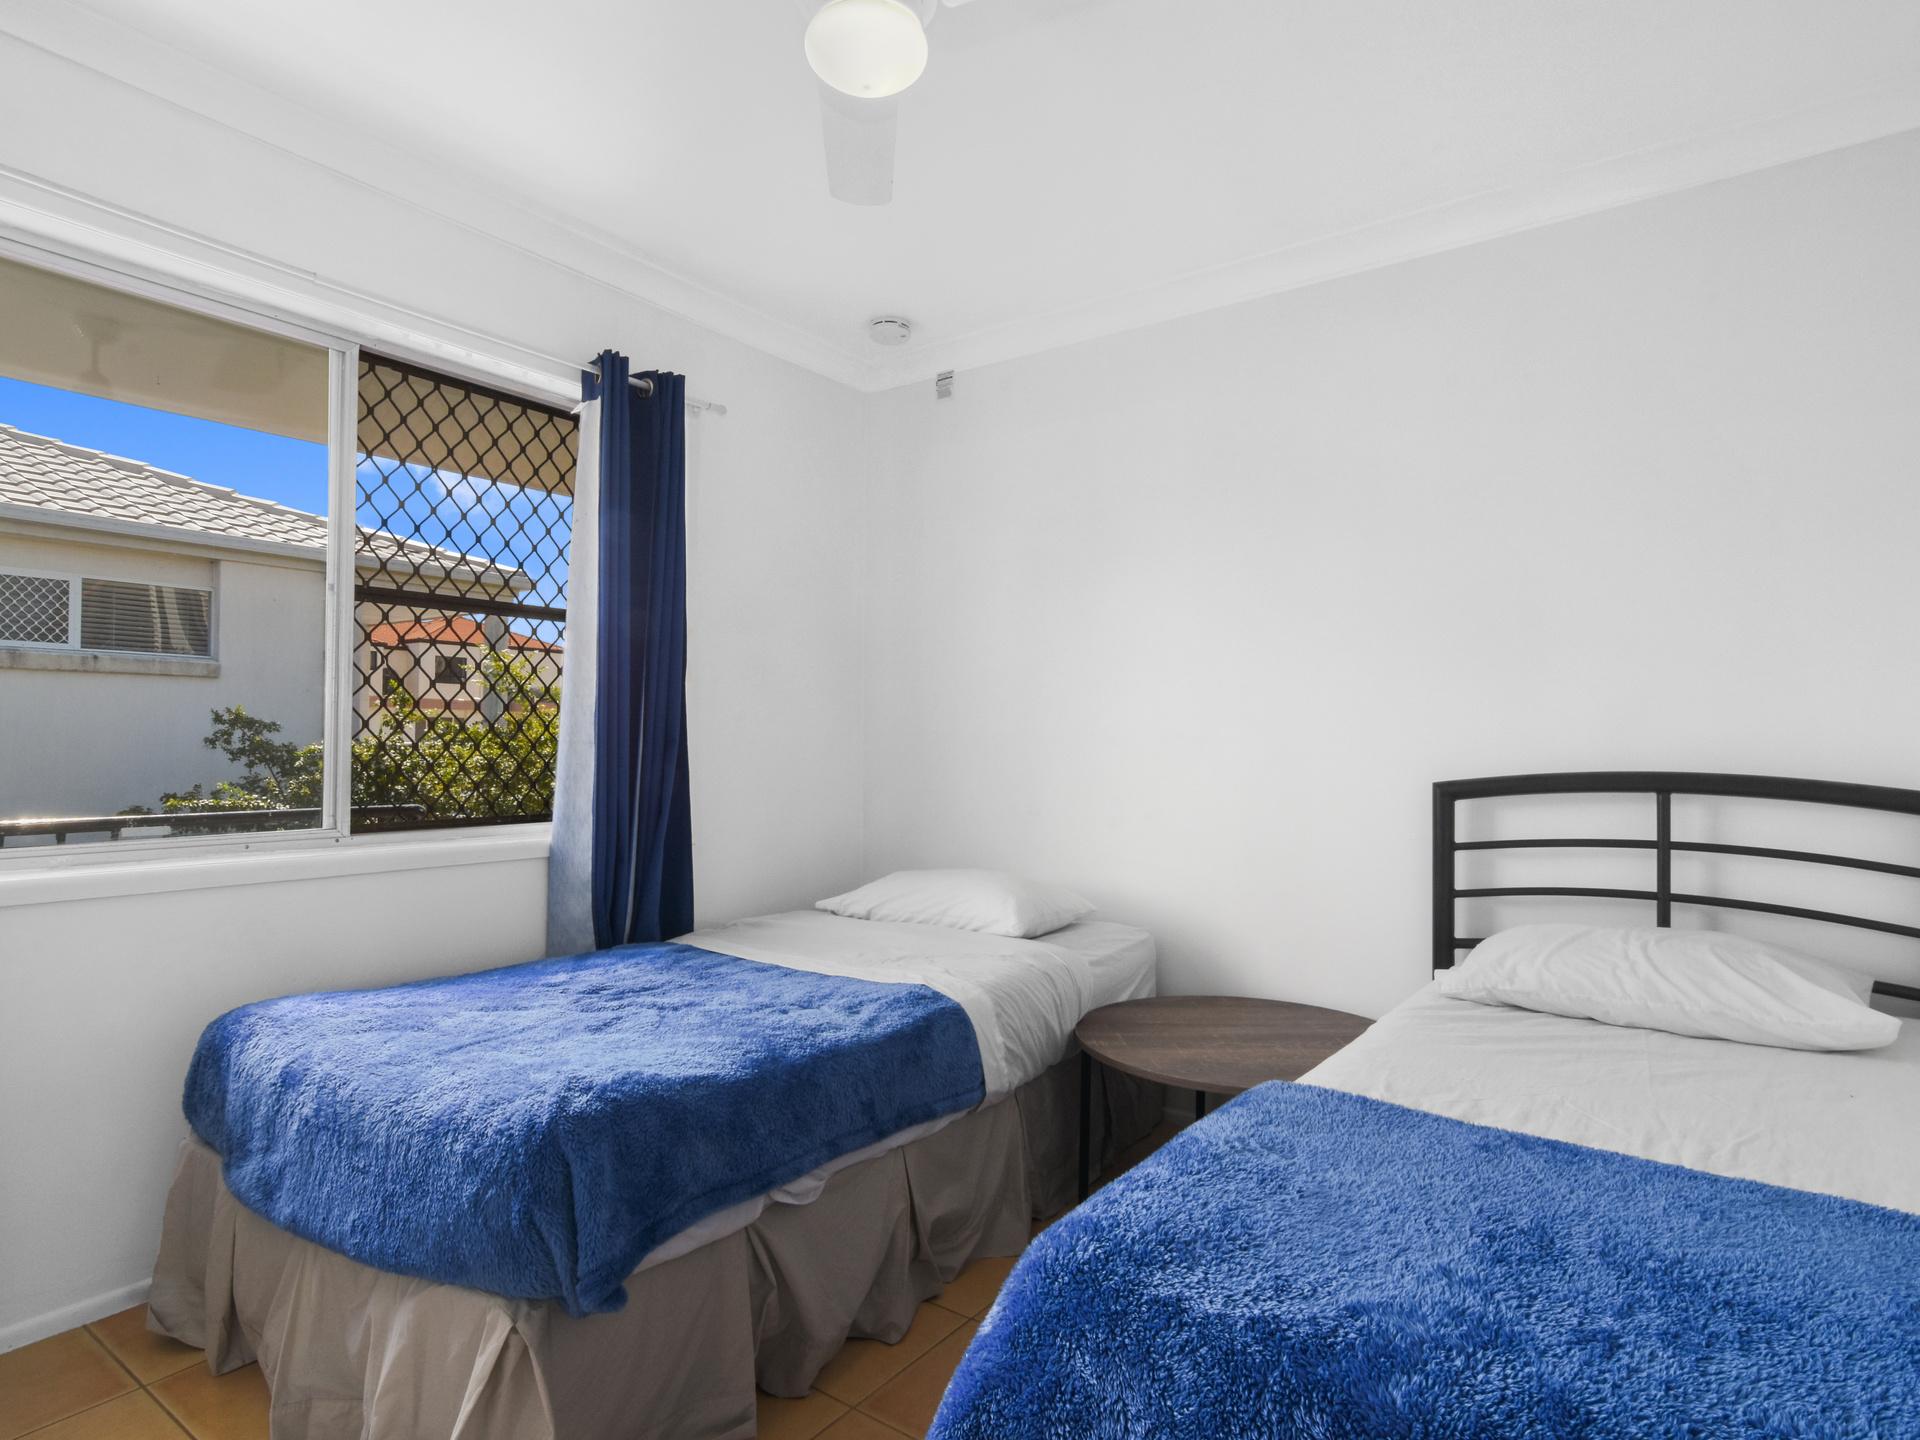 Real Estate | Gold Coast | Chevron Realty | 002 Open2view Id532048 4 35 Darrambal Street Chevron Island